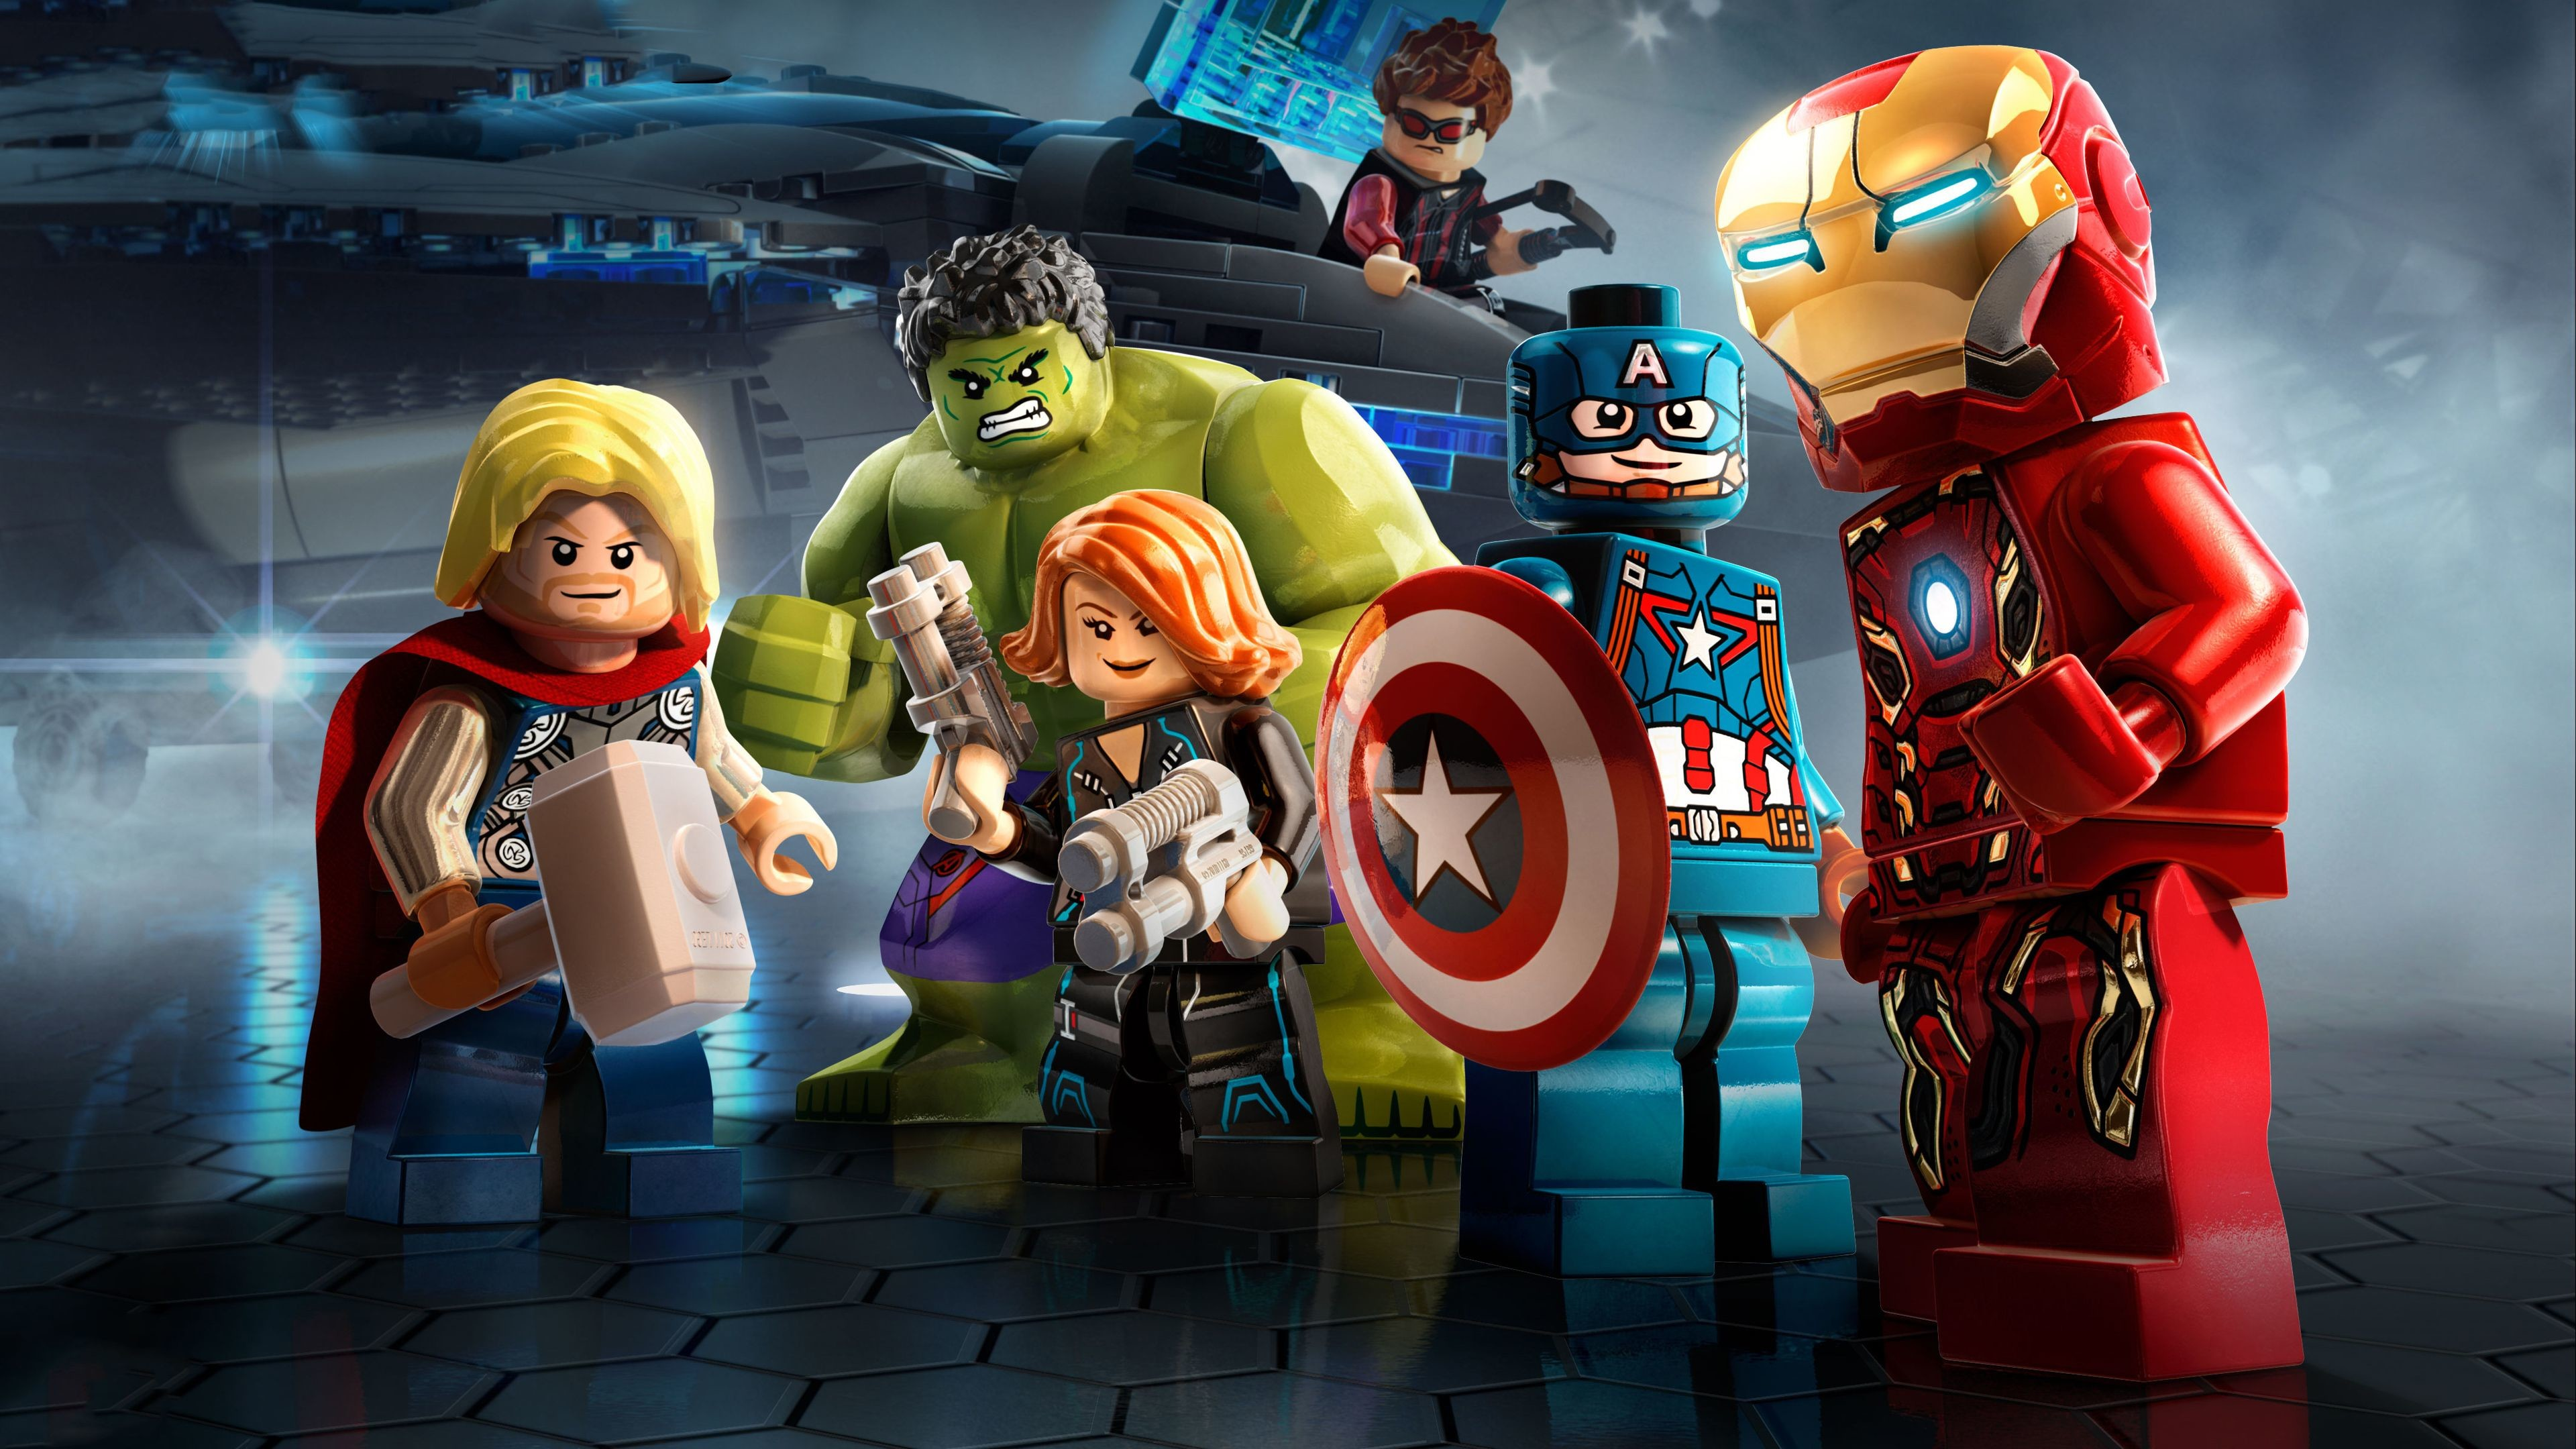 Res: 3840x2160, Marvel Avengers Lego 4k superheroes wallpapers, lego wallpapers, hd- wallpapers, avengers-wallpapers, 4k-wallpapers